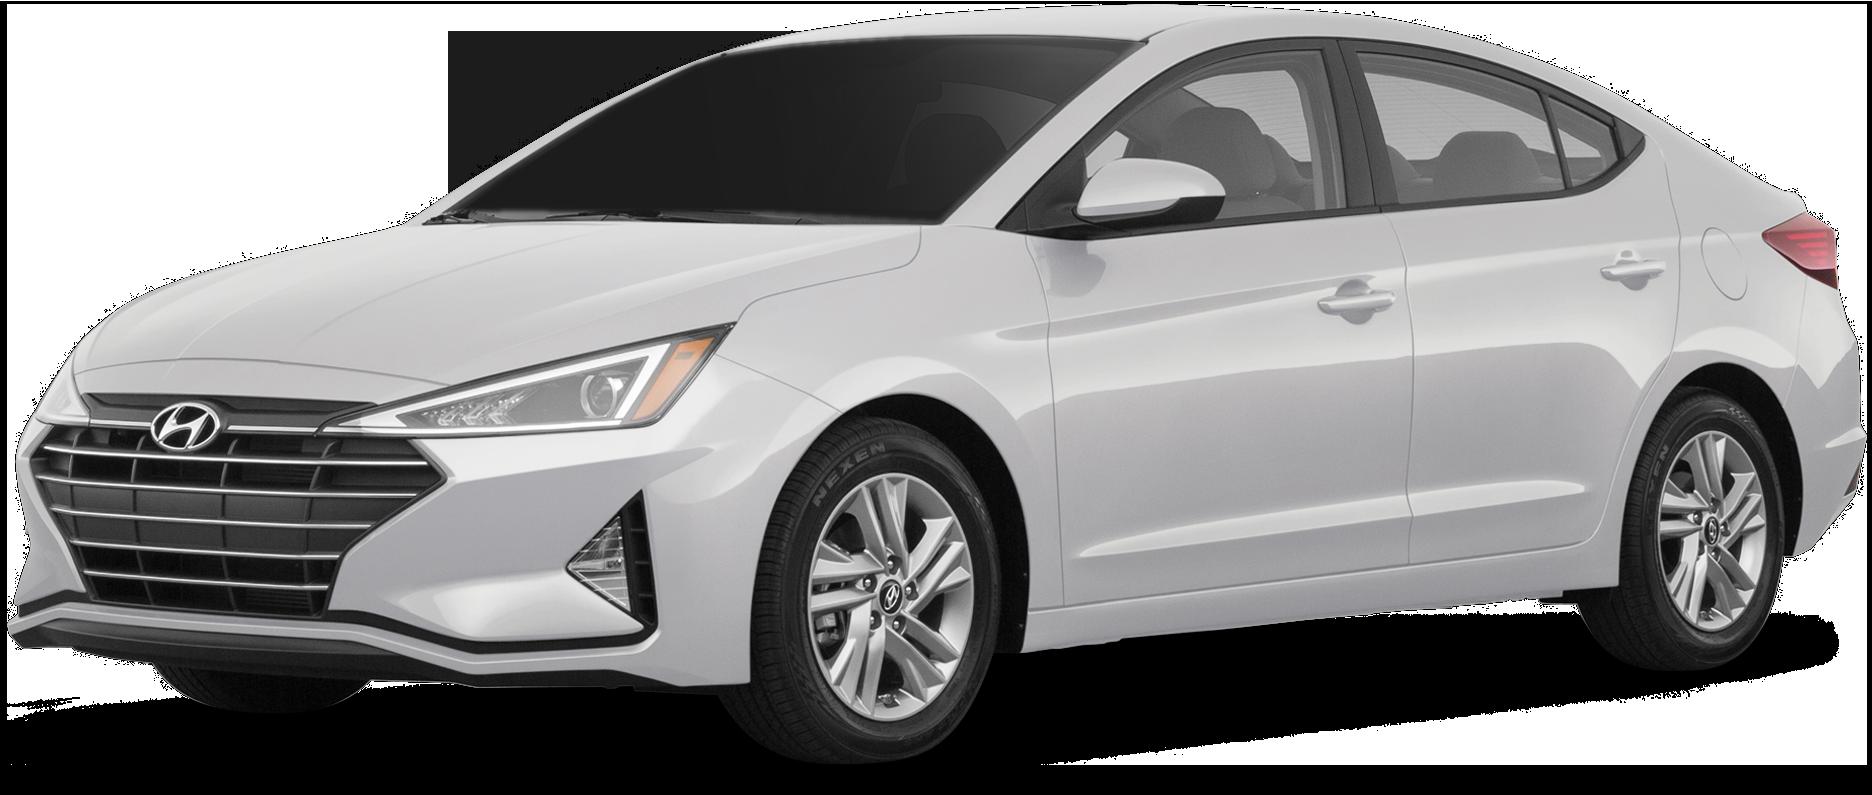 2020 Hyundai Elantra Incentives, Specials & Offers in ...